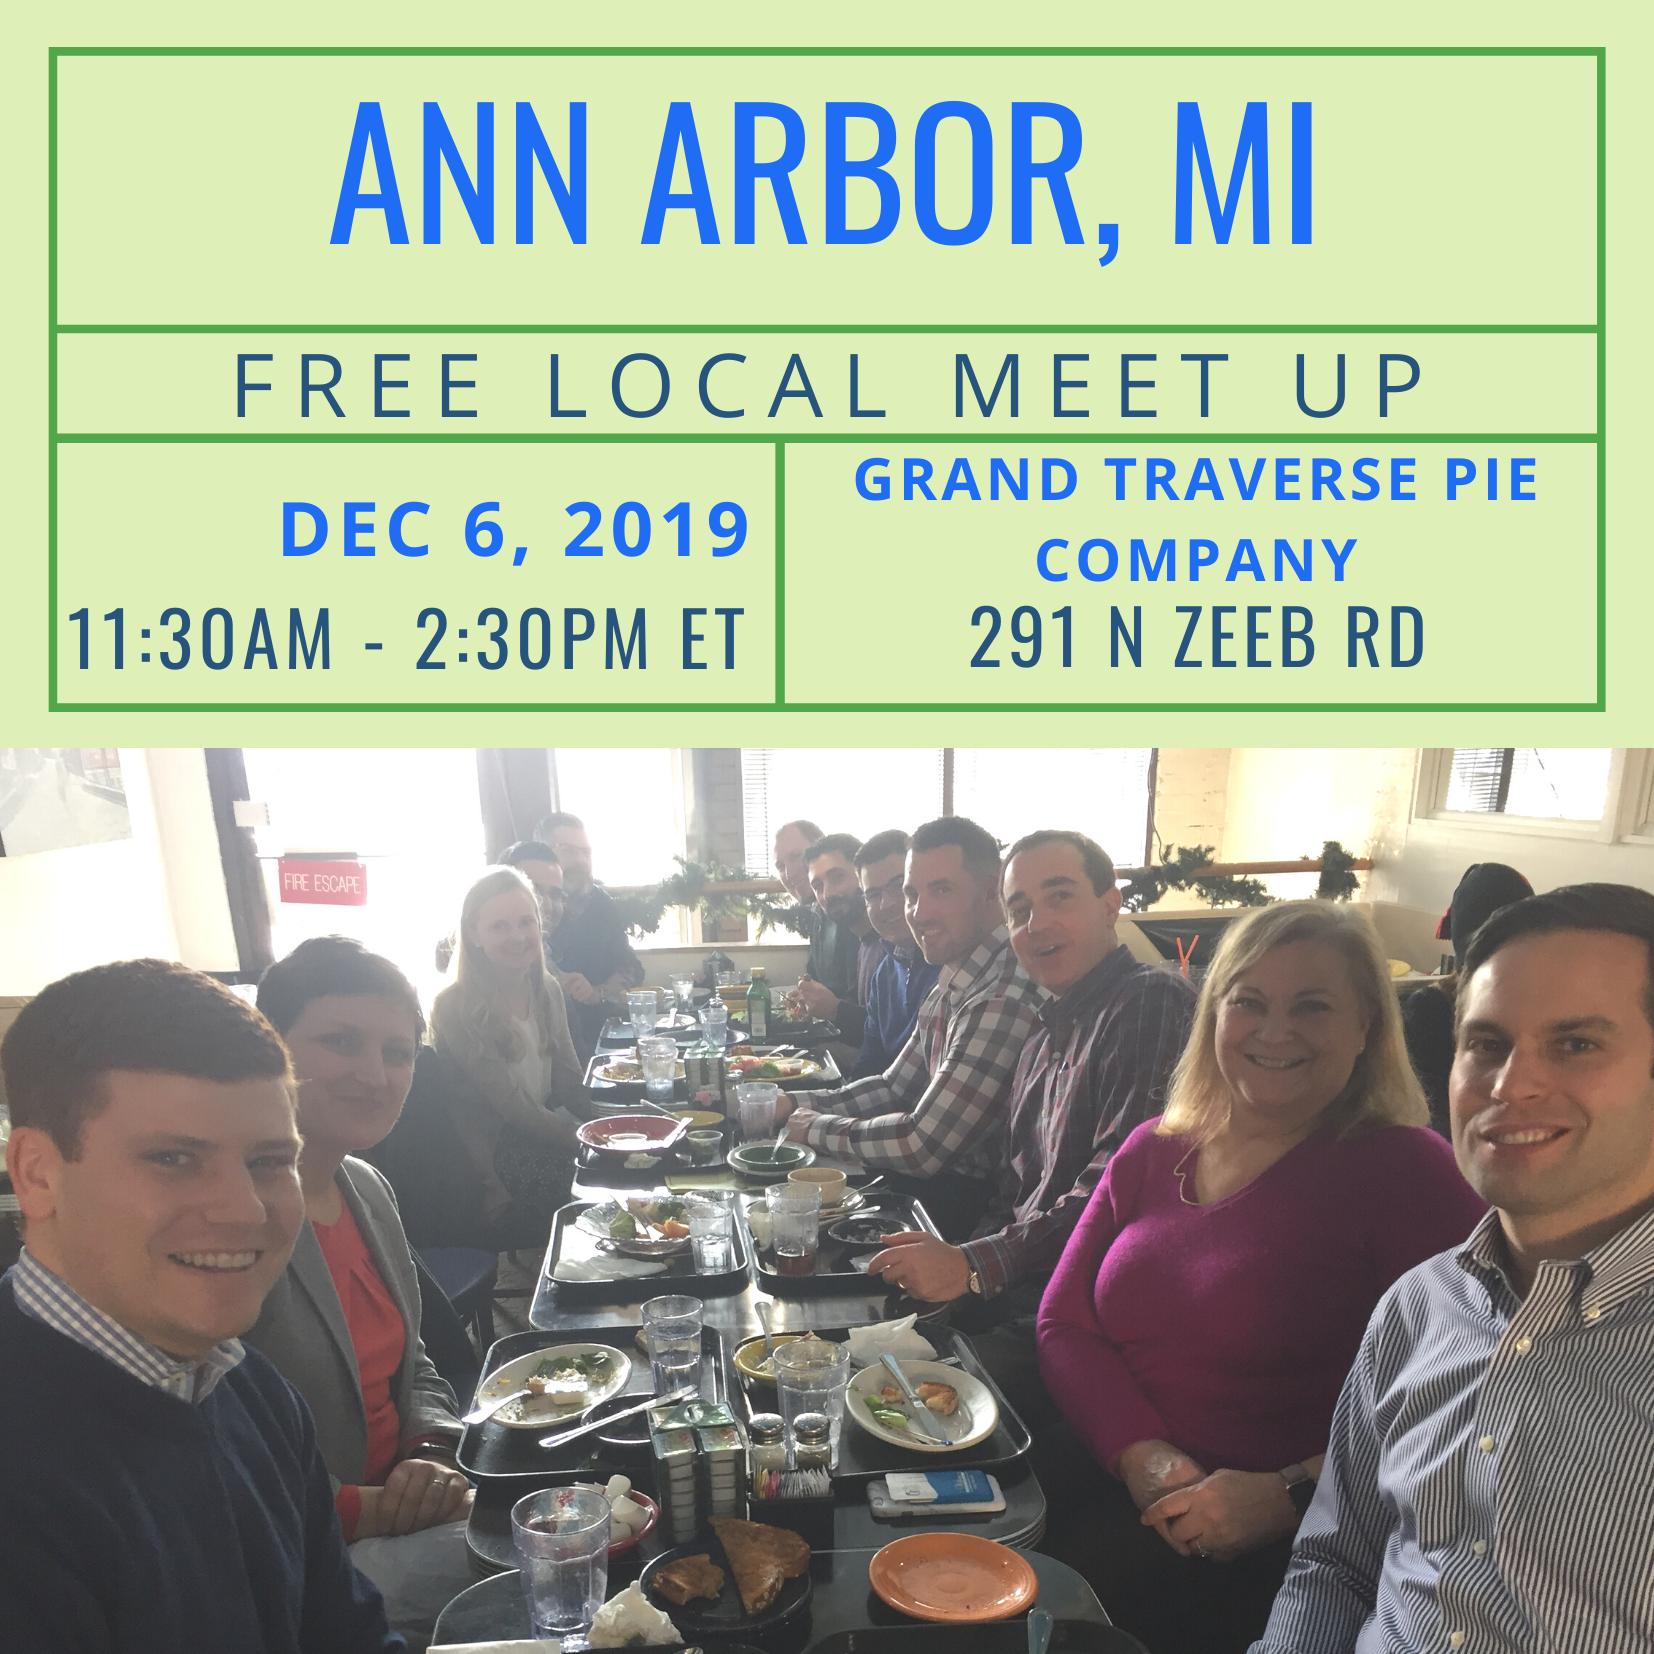 FREE Local Meet-Up: Ann Arbor, MI on December 6, 2019